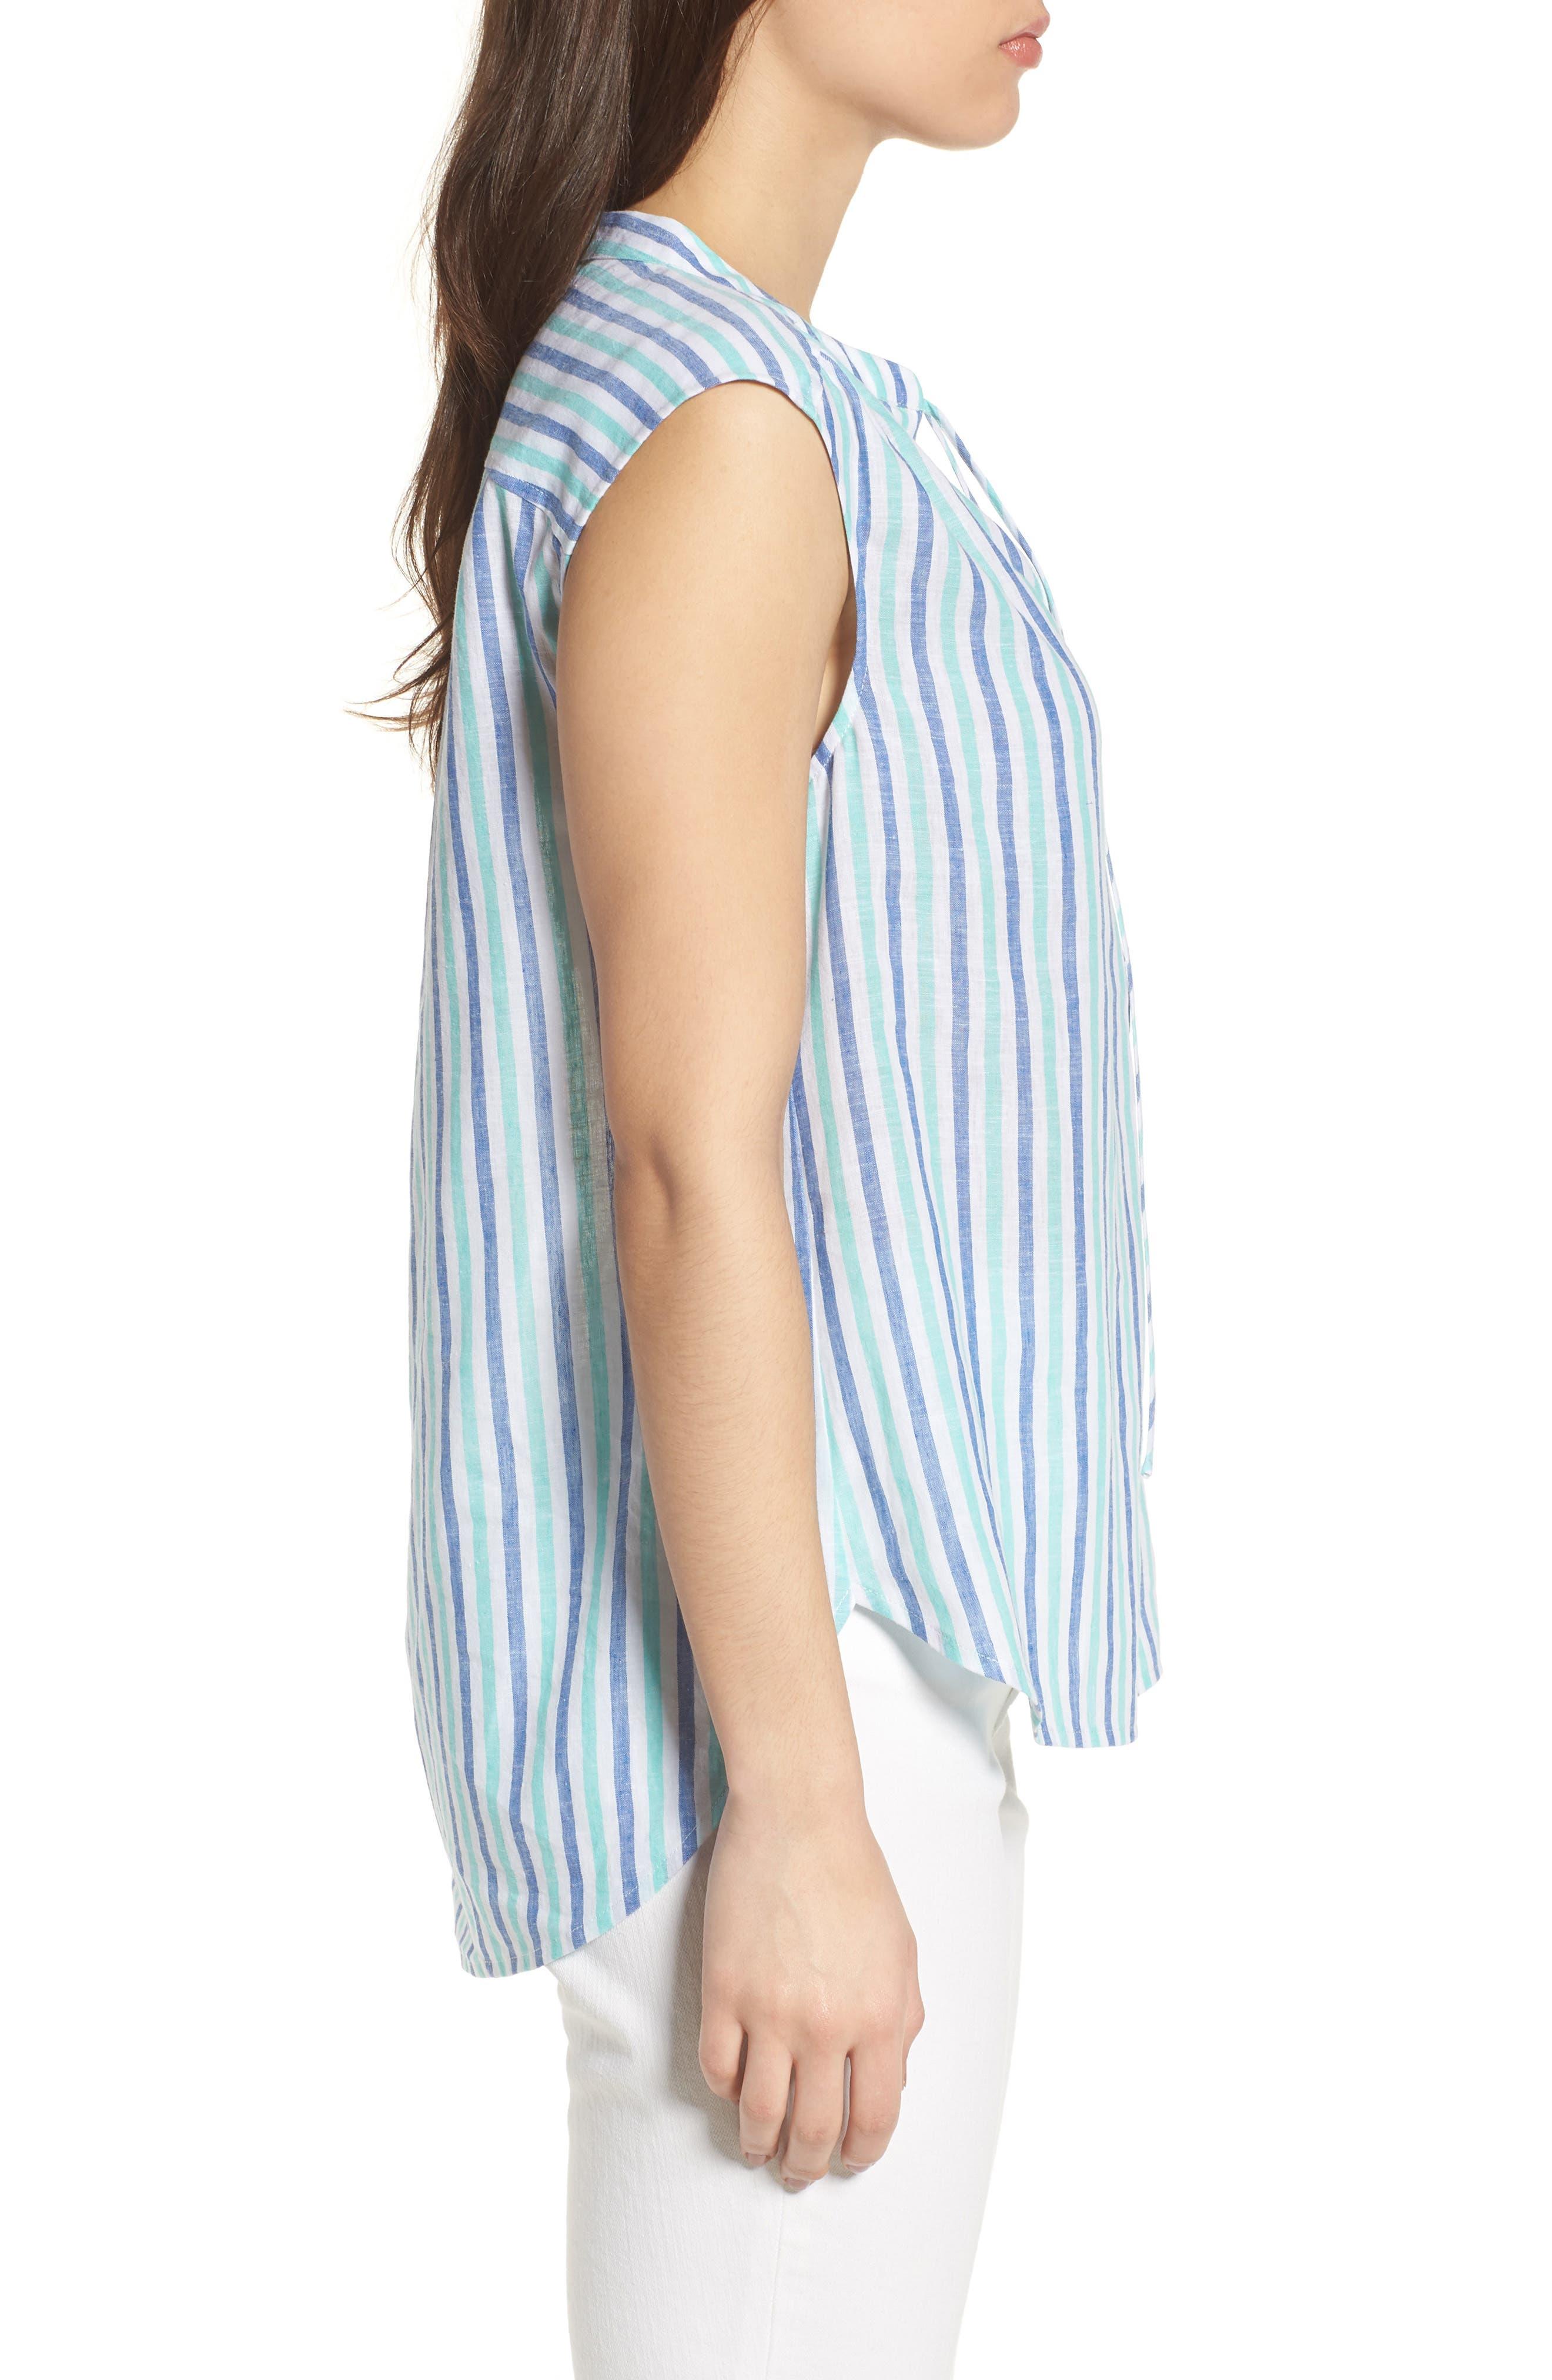 Hope Bay Linen Cotton Stripe Top,                             Alternate thumbnail 3, color,                             Capri Blue